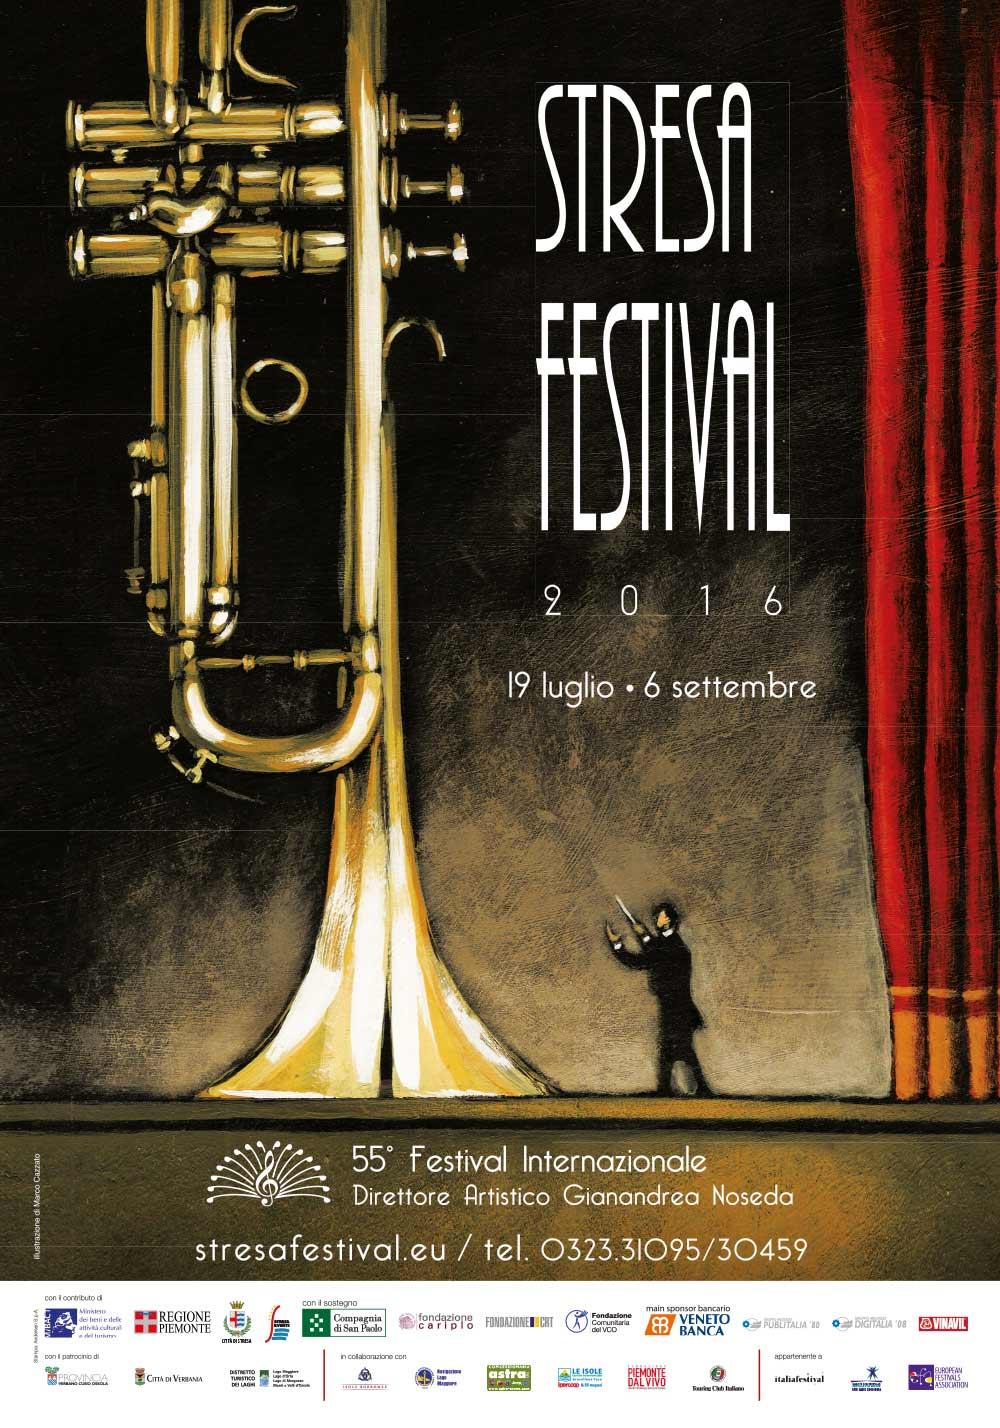 Stresa-Festival-locandina-2016